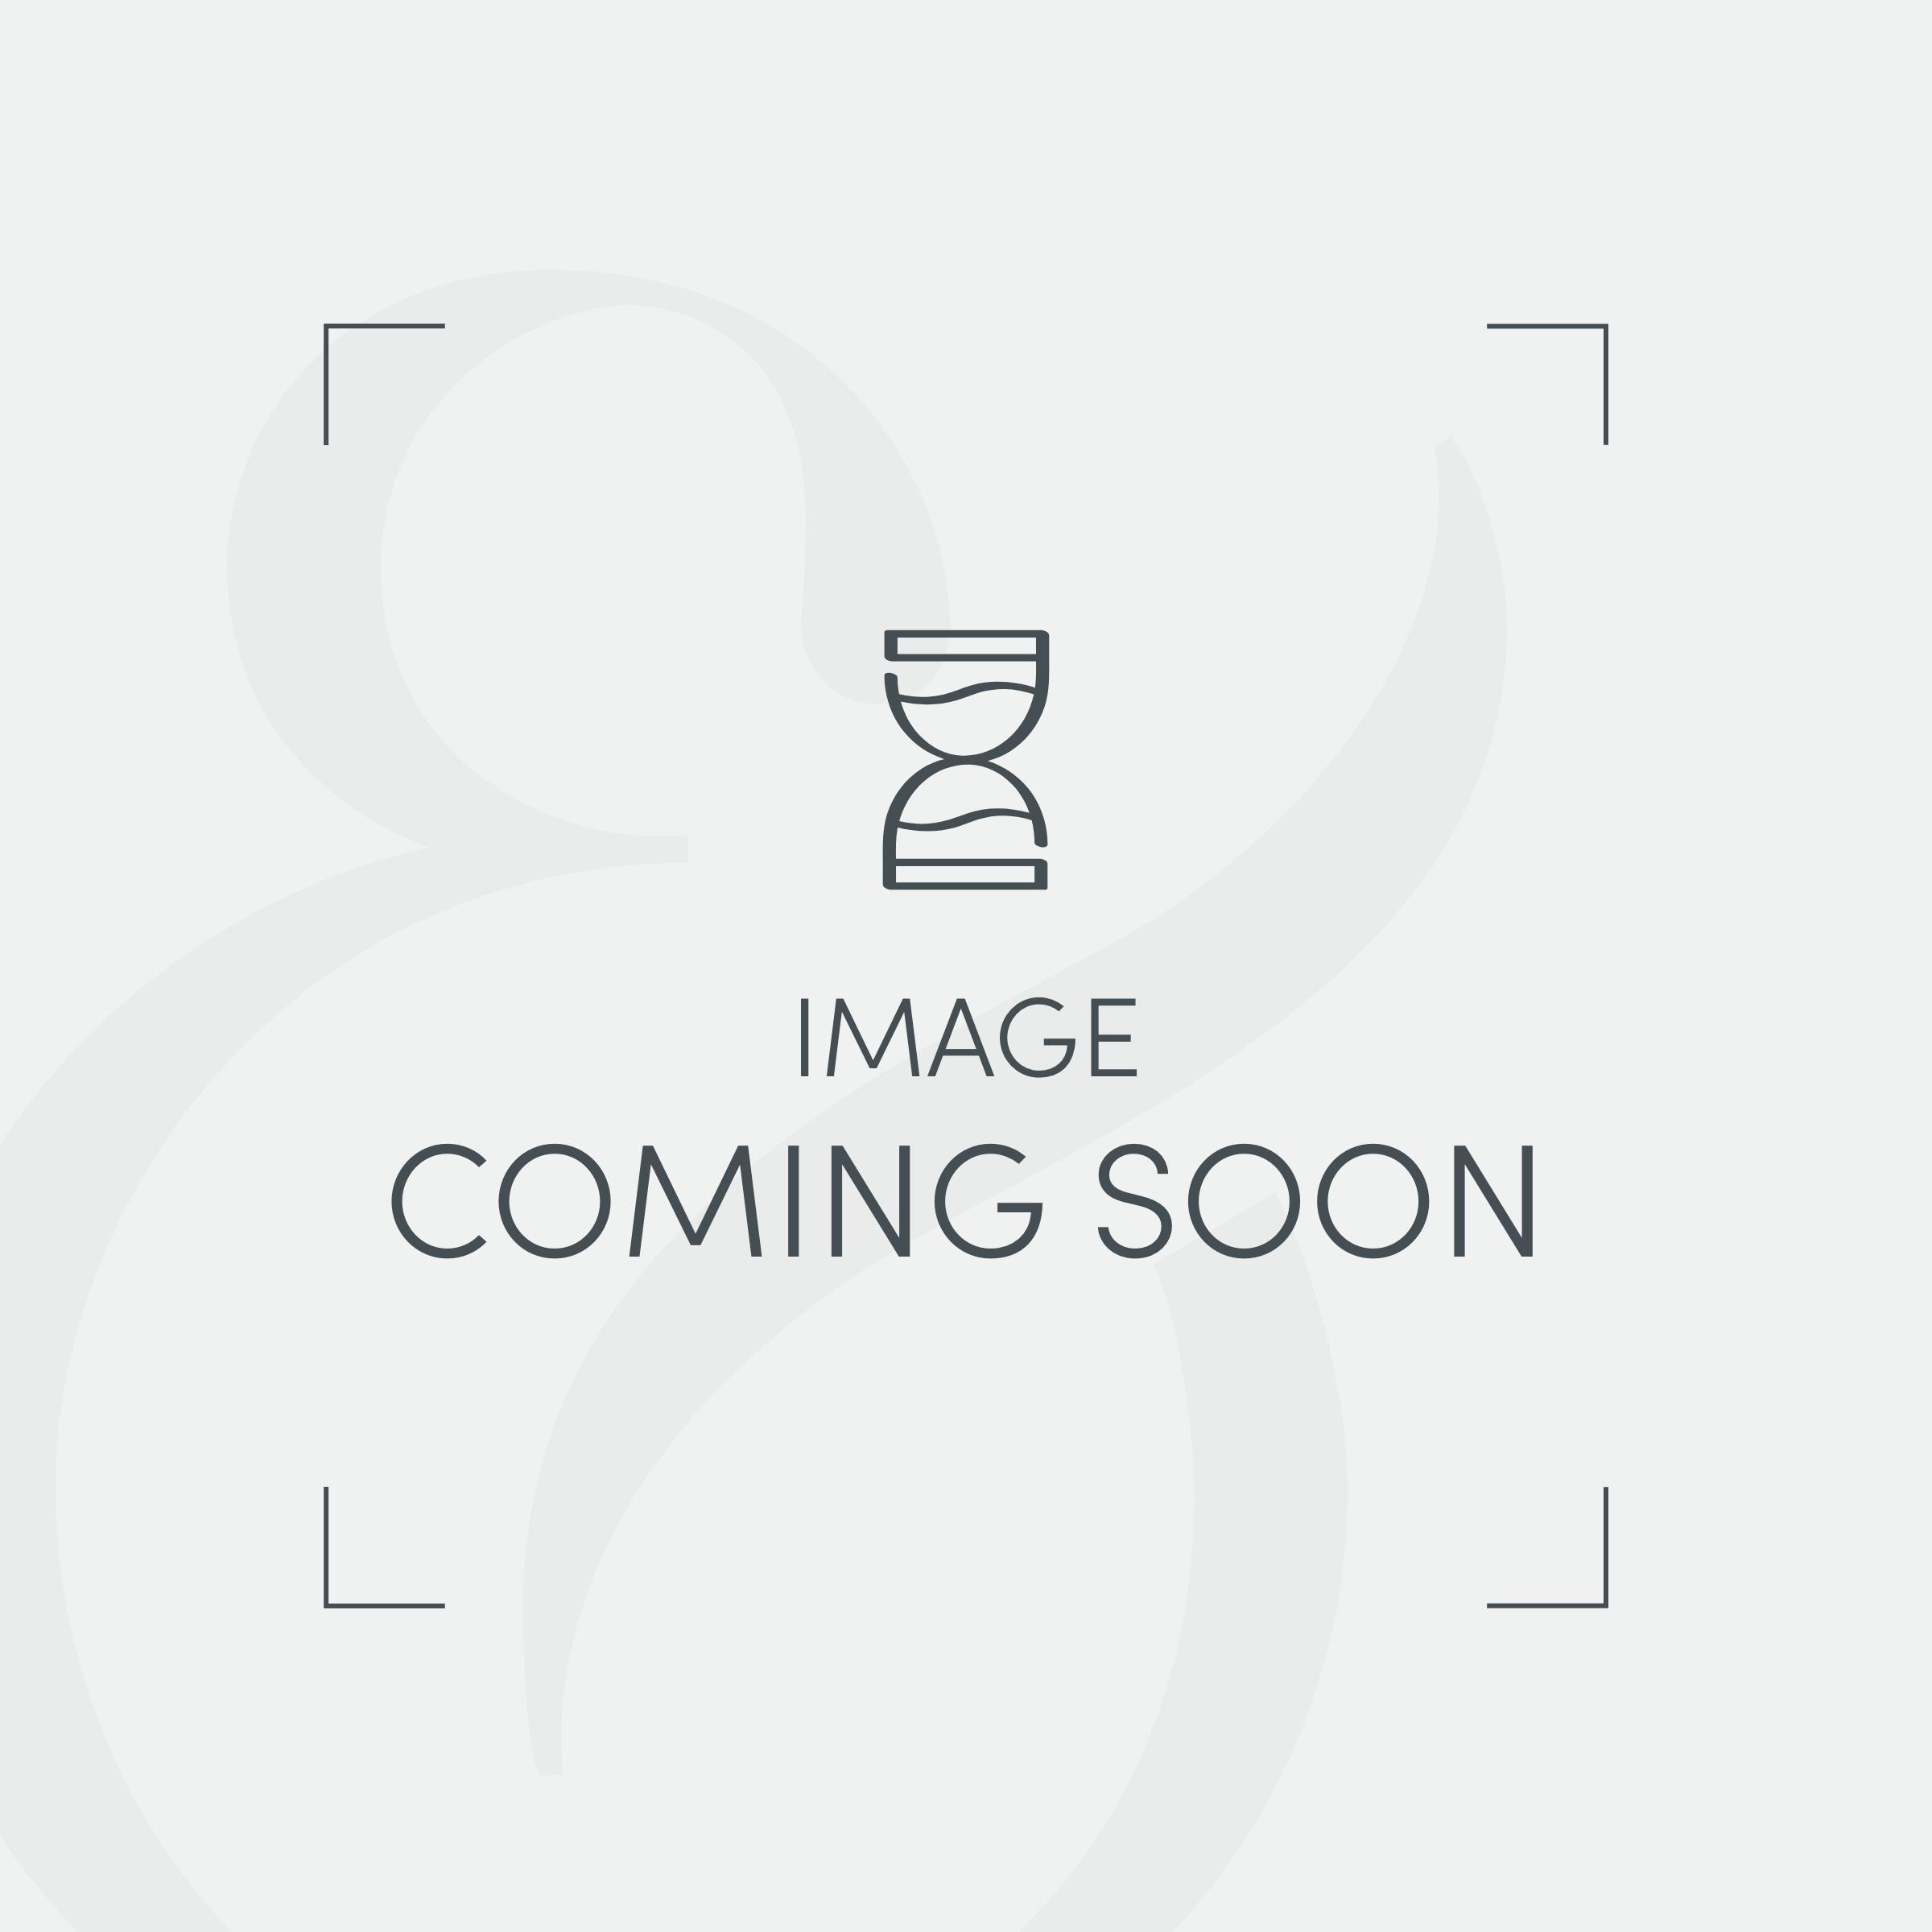 Egyptian Towel Set (2 x Hand Towels, 2 x Bath Towels) - Taupe